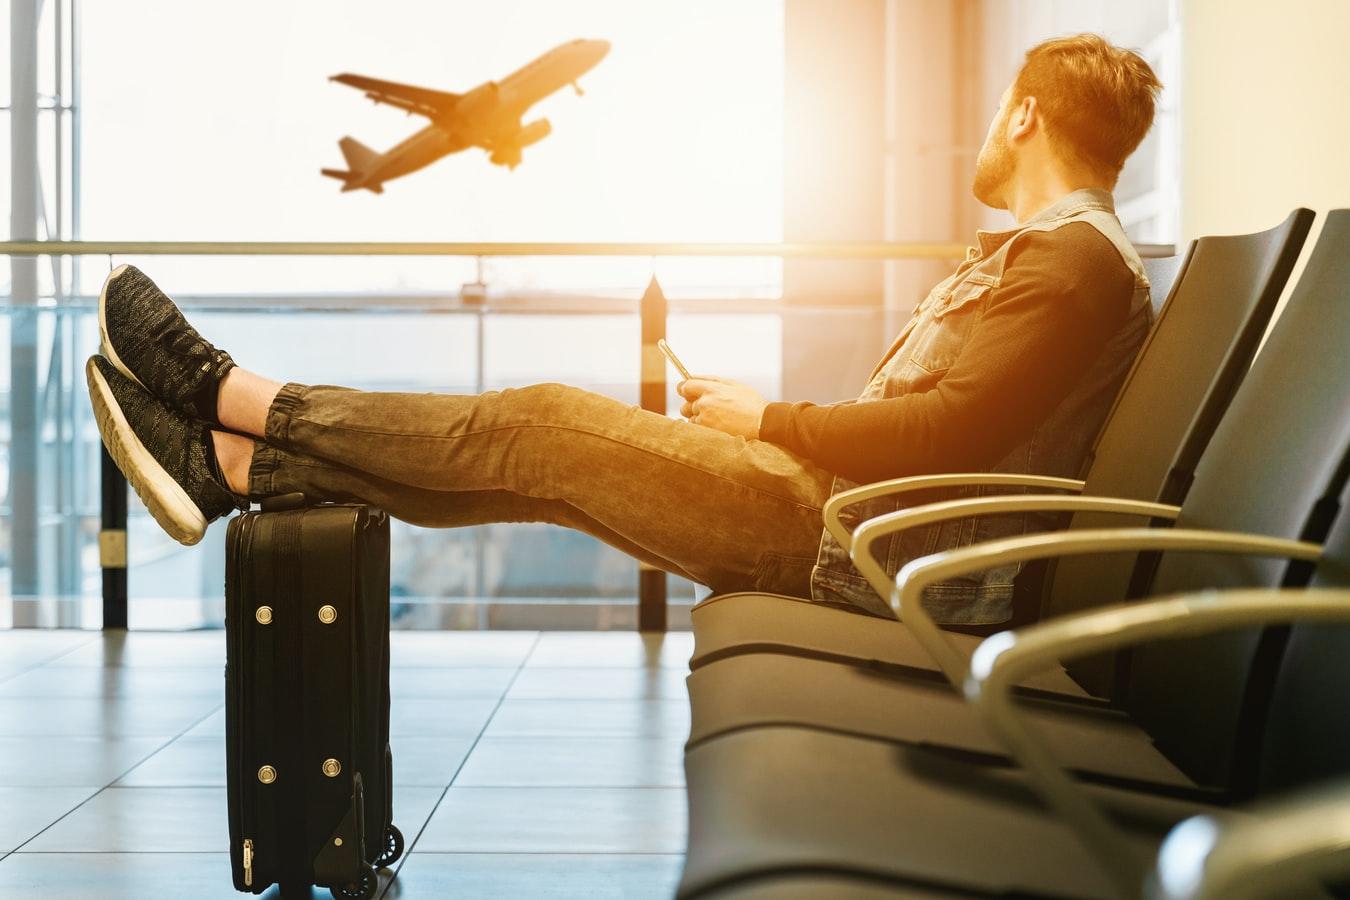 Rimborsi per ritardi dei voli durante la pandemia